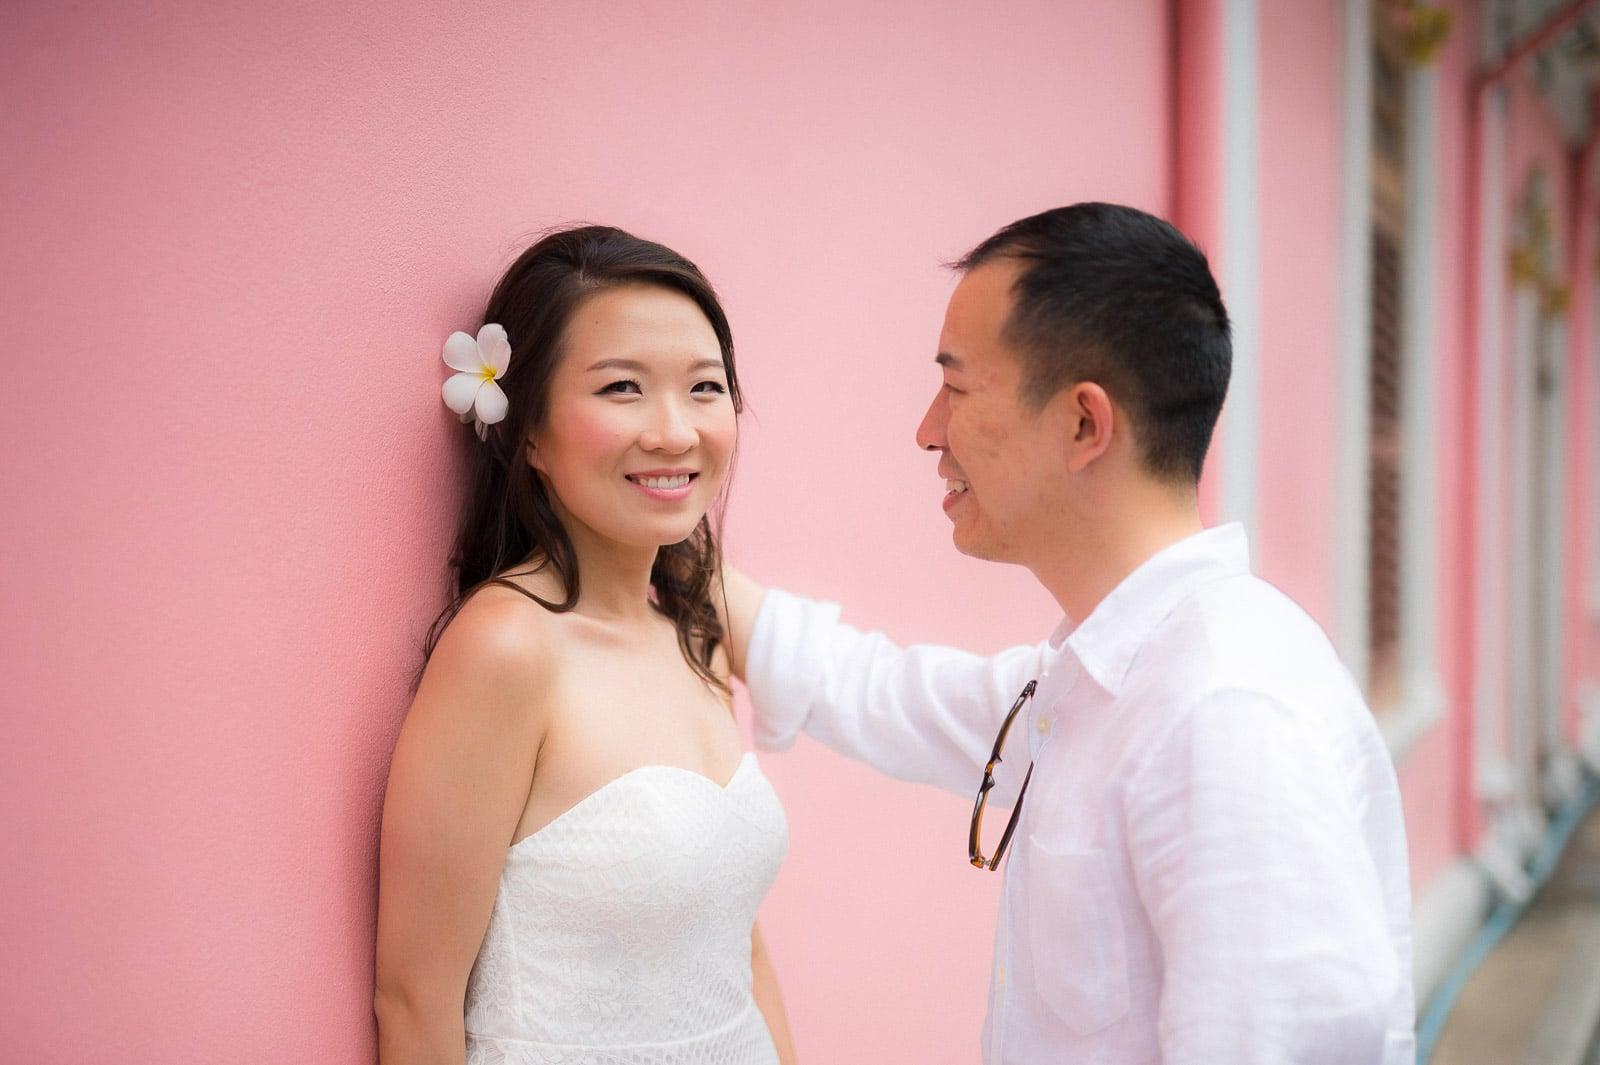 phuket-prewedding-photographer-thailand-wedding-photography-006